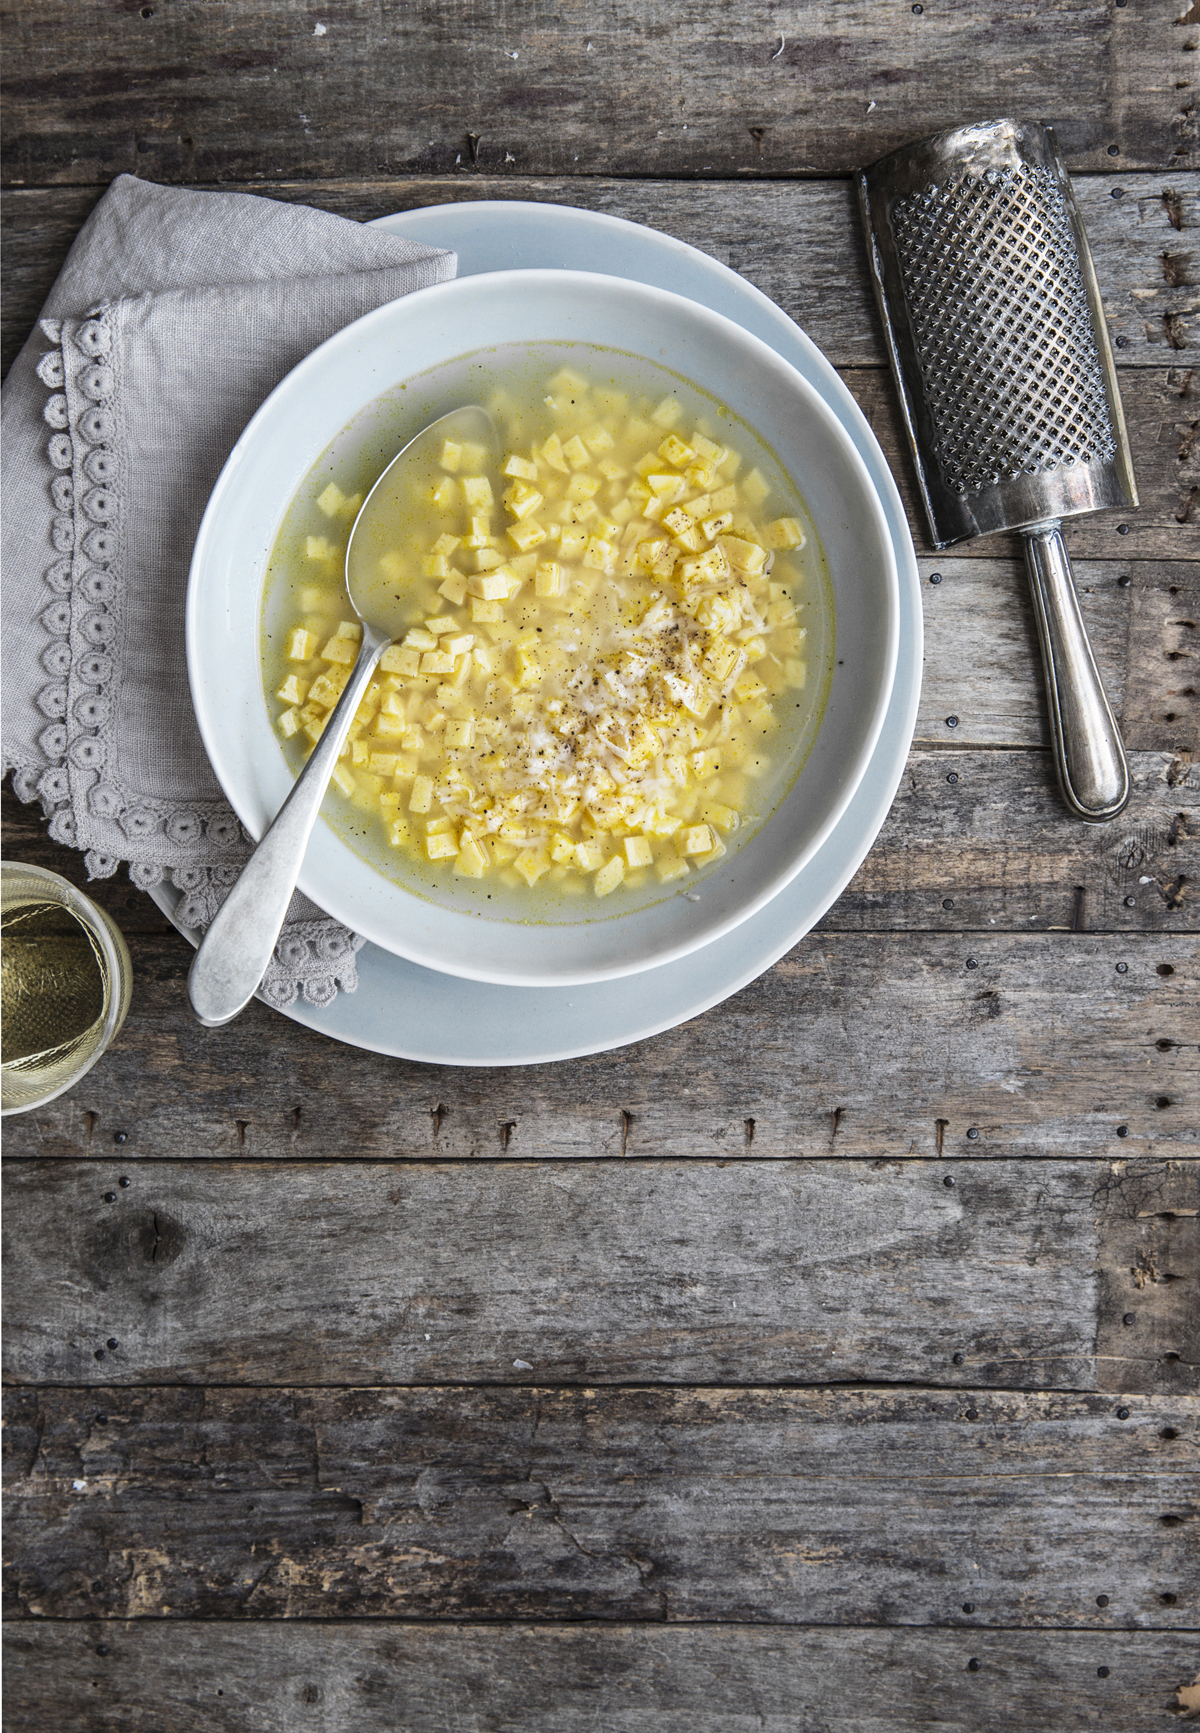 zuppa imperiale Rossella Venezia